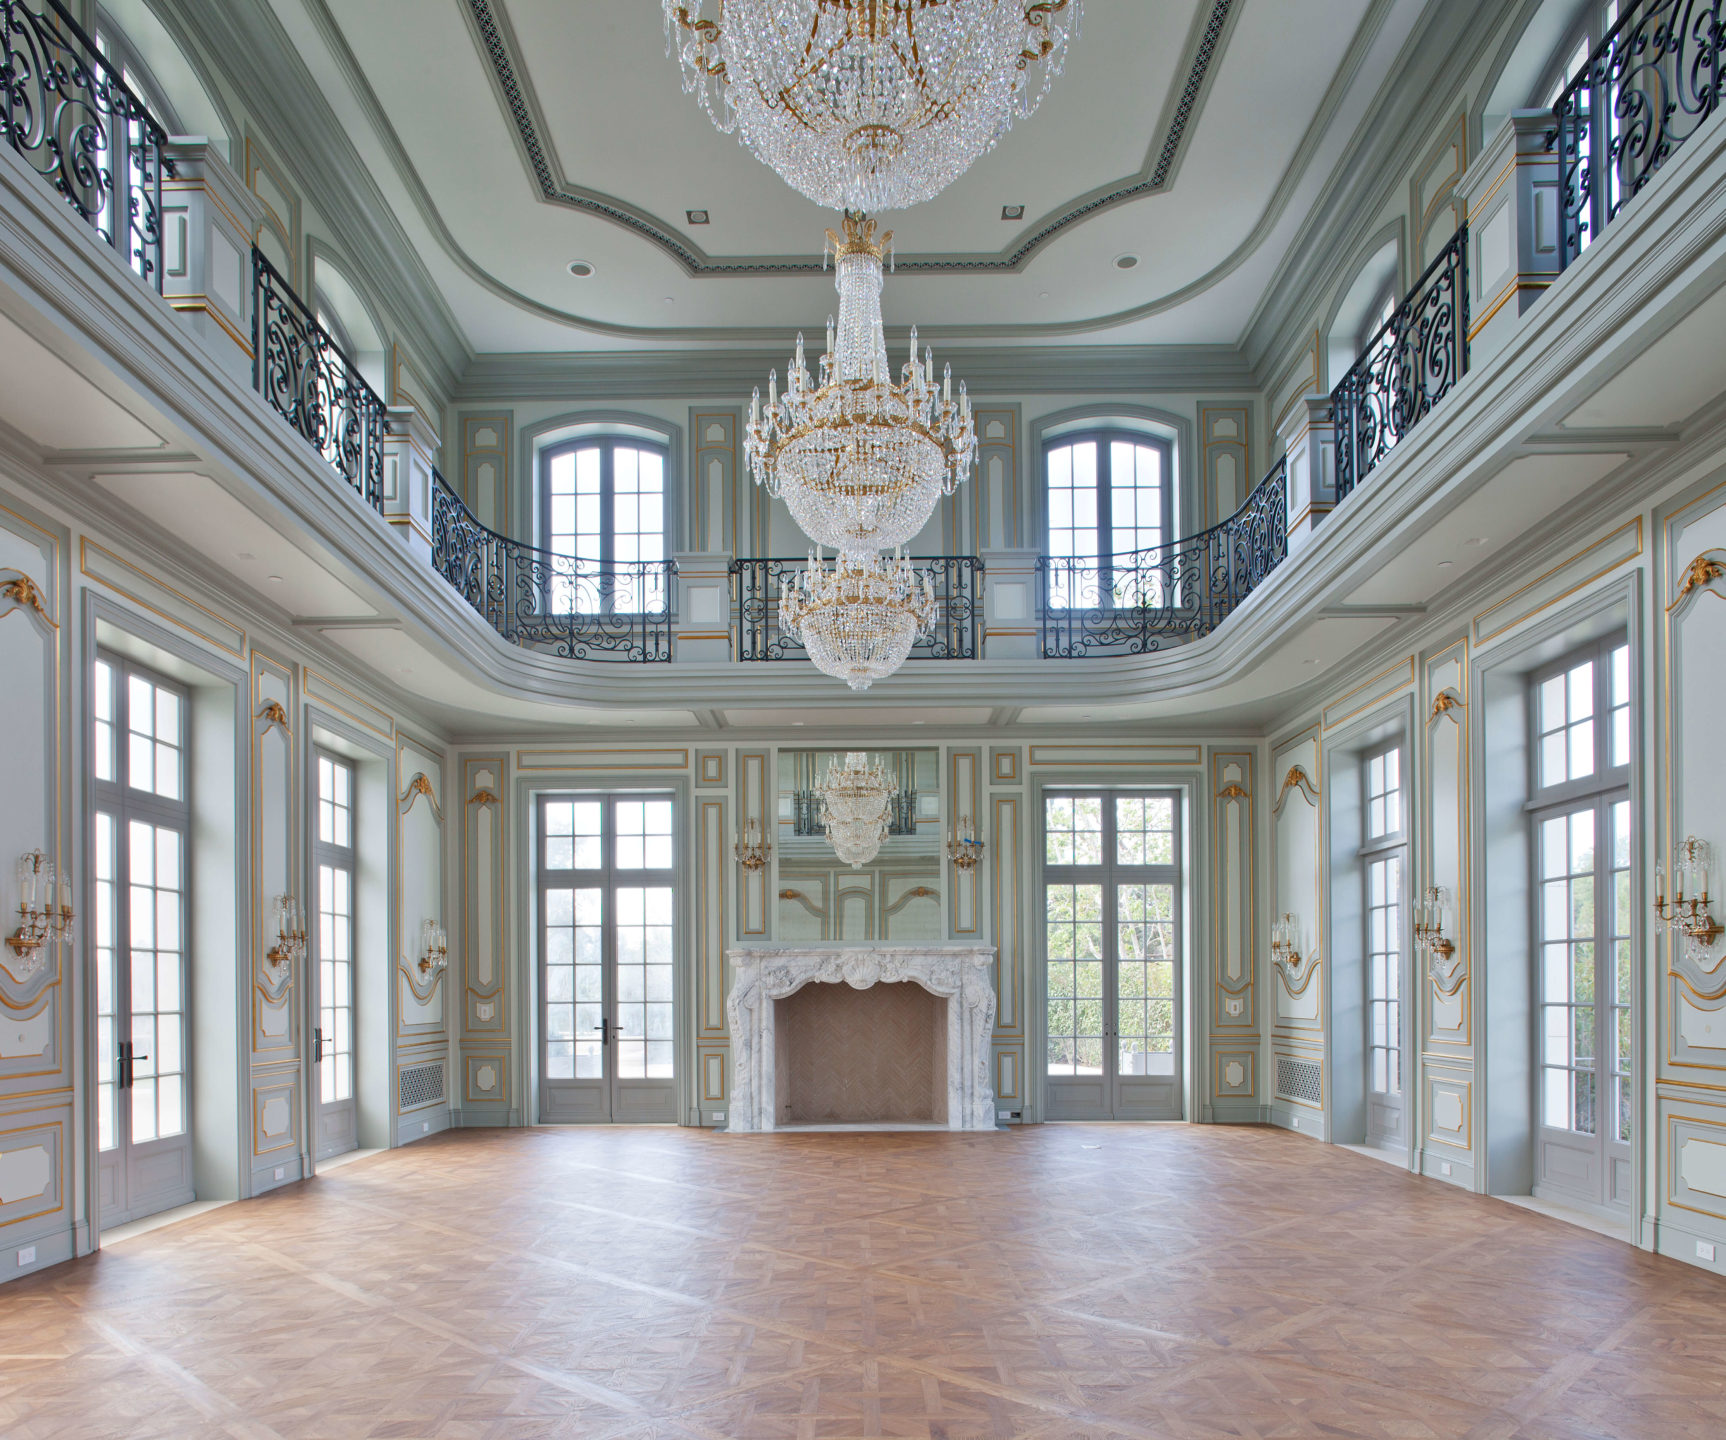 studio-william-hefner-chateau-des-fleurs-29